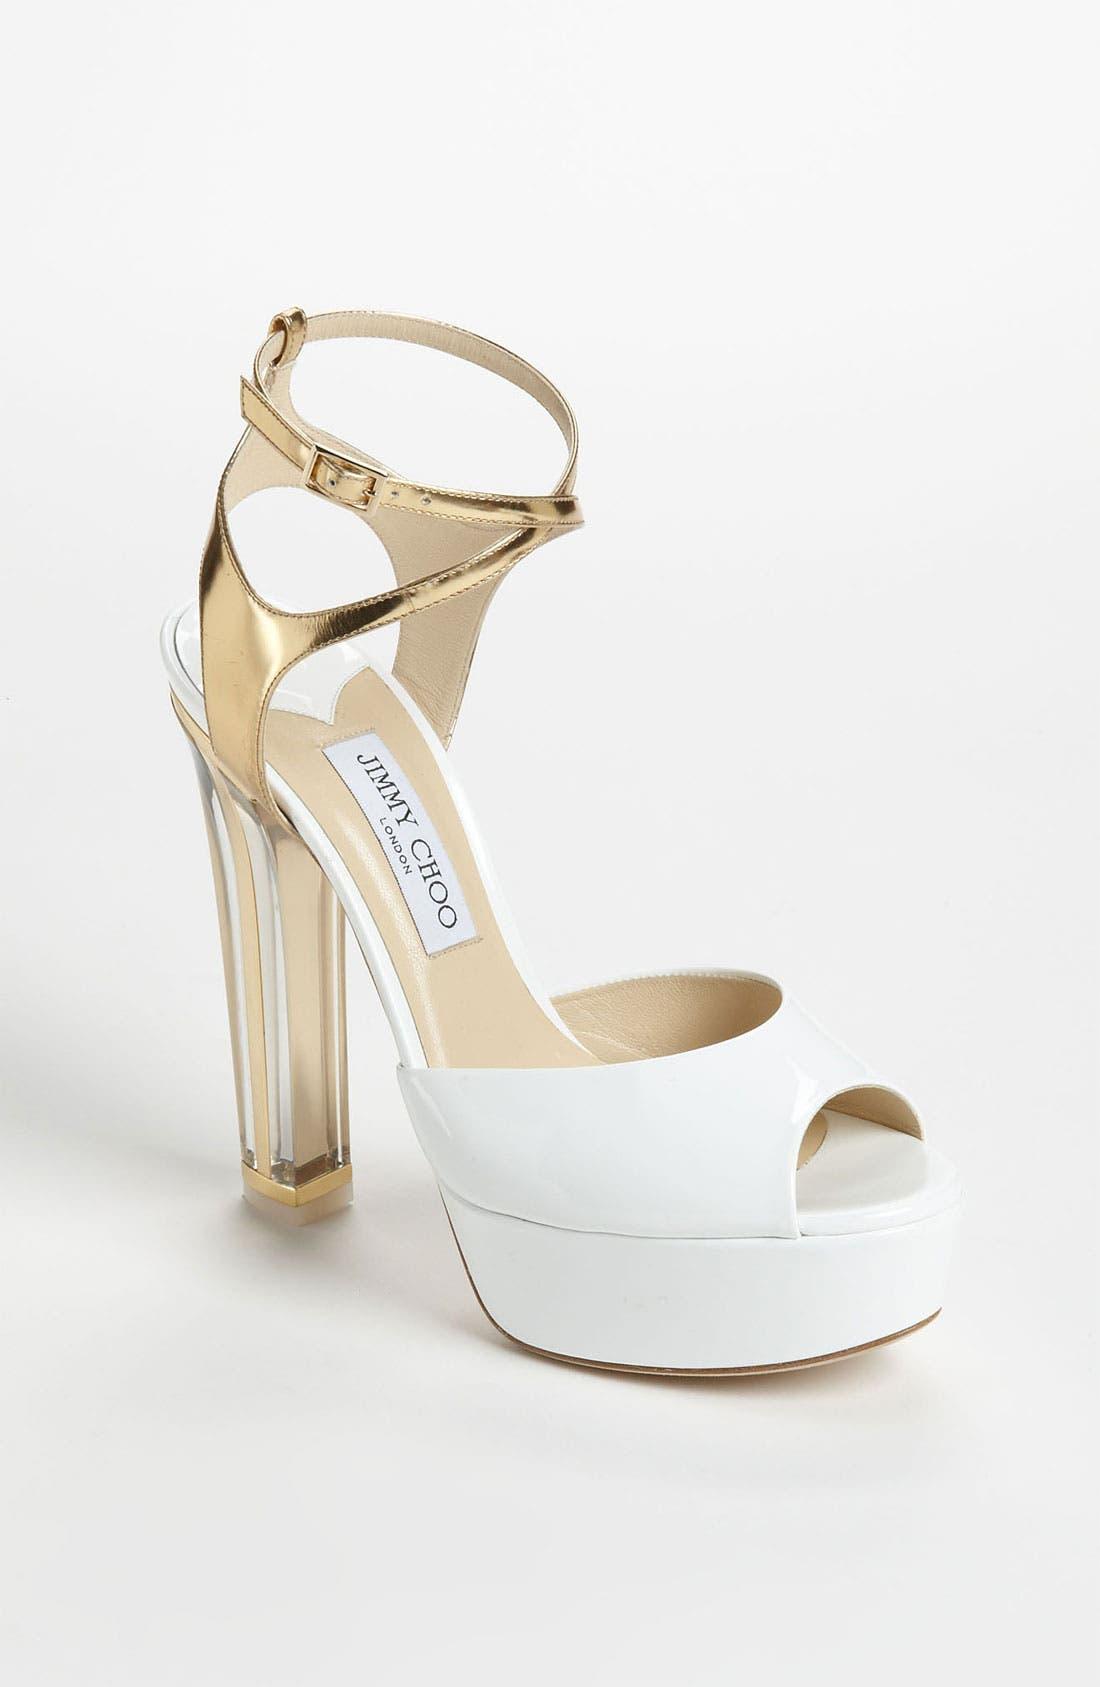 Alternate Image 1 Selected - Jimmy Choo 'Lolita' Platform Sandal